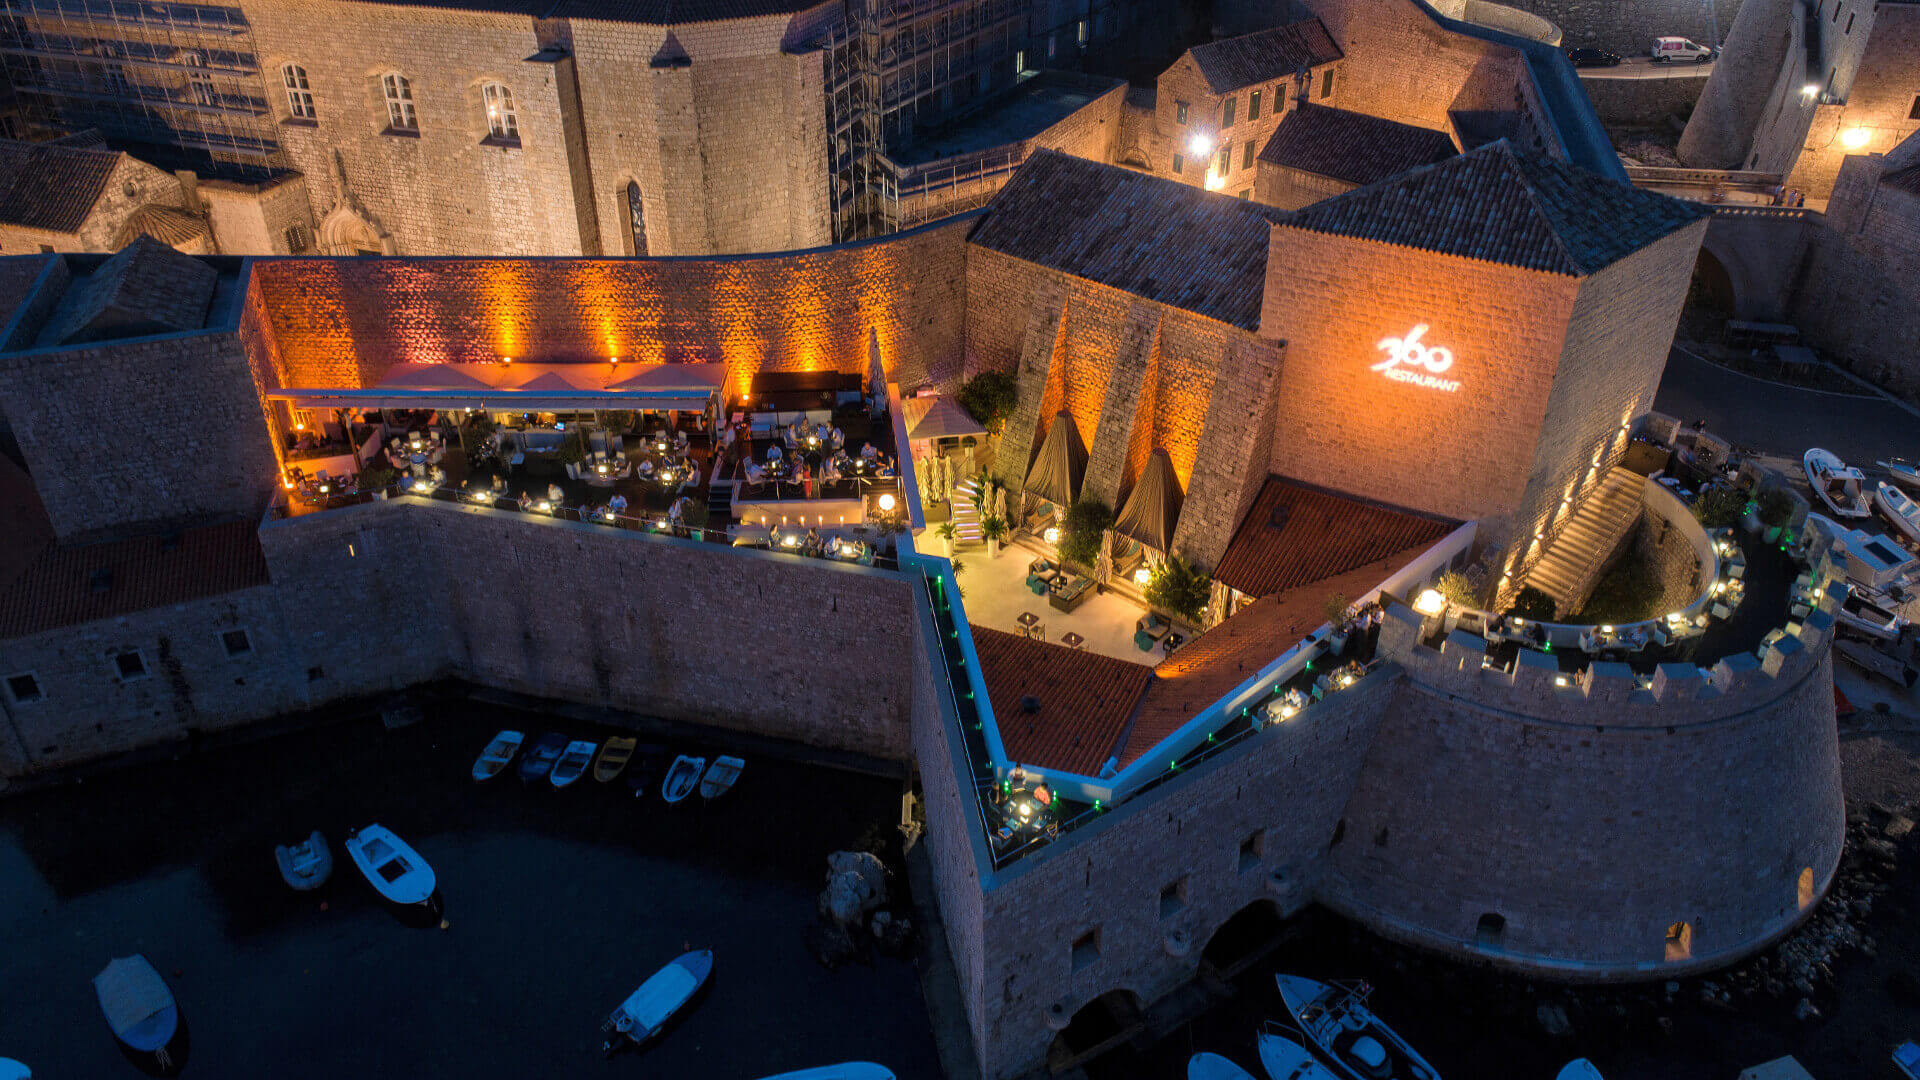 Top 5 Fine Dining Restaurants In Dubrovnik Dubrovnik Tour